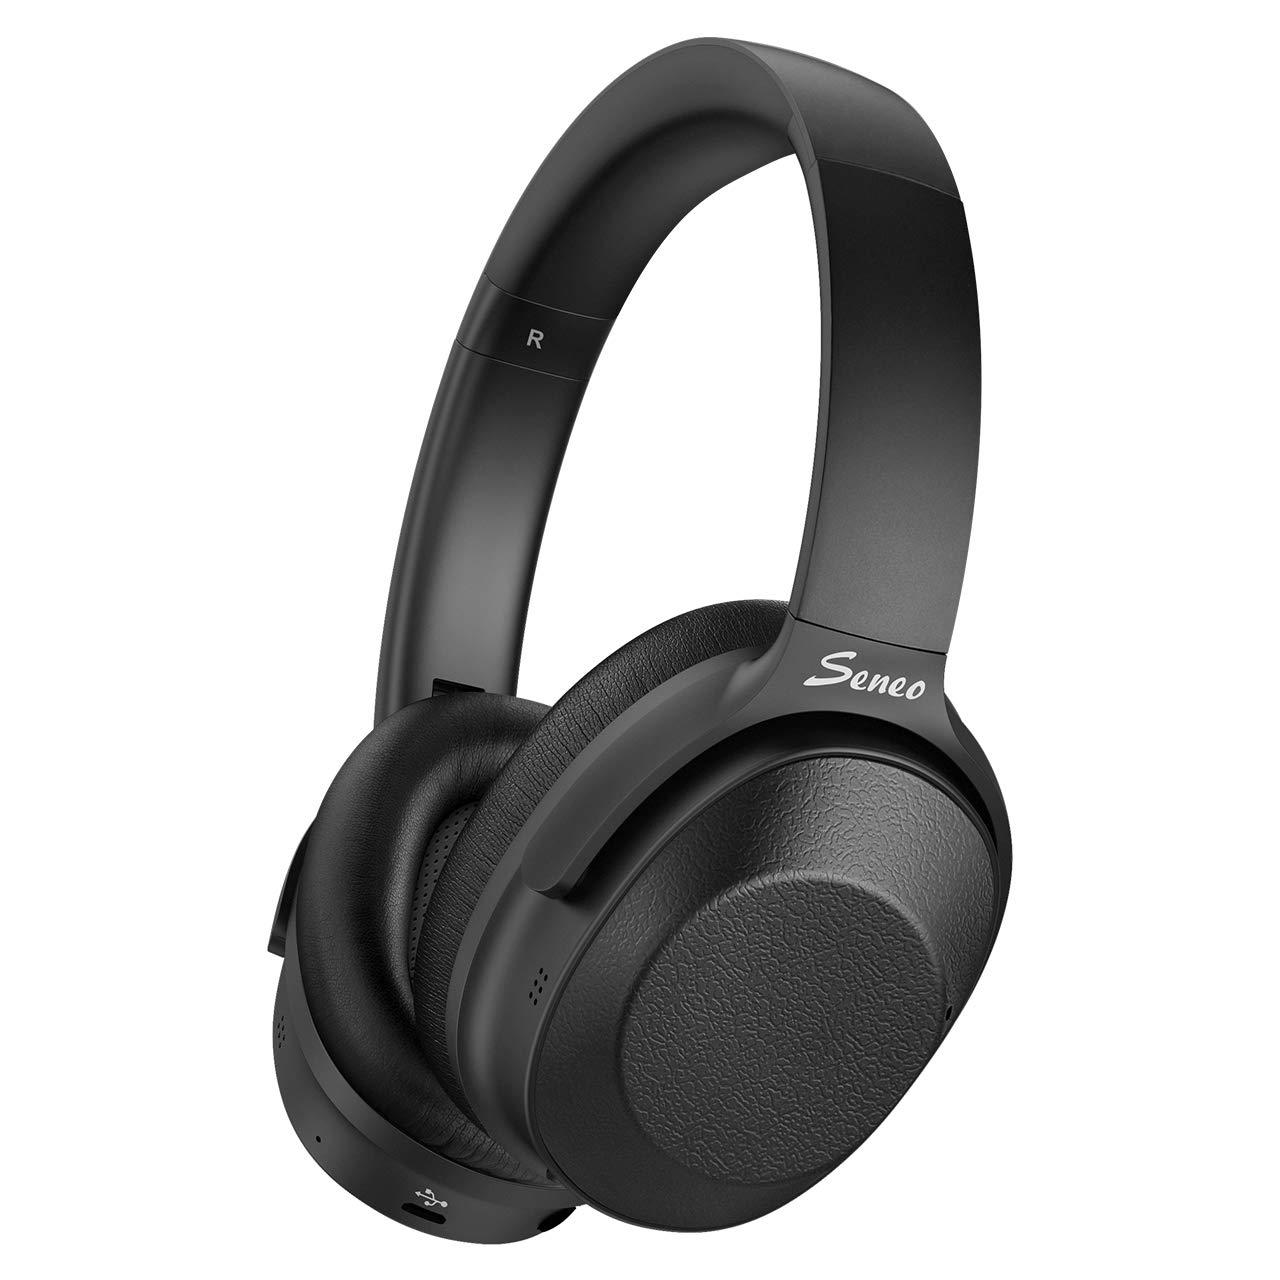 Auriculares Seneo Hybrid Cancelacion de Ruido Bluetooth Hi-Fi Sound Inalambrico 30-horas Duracion Soft Memory-Protein Ea